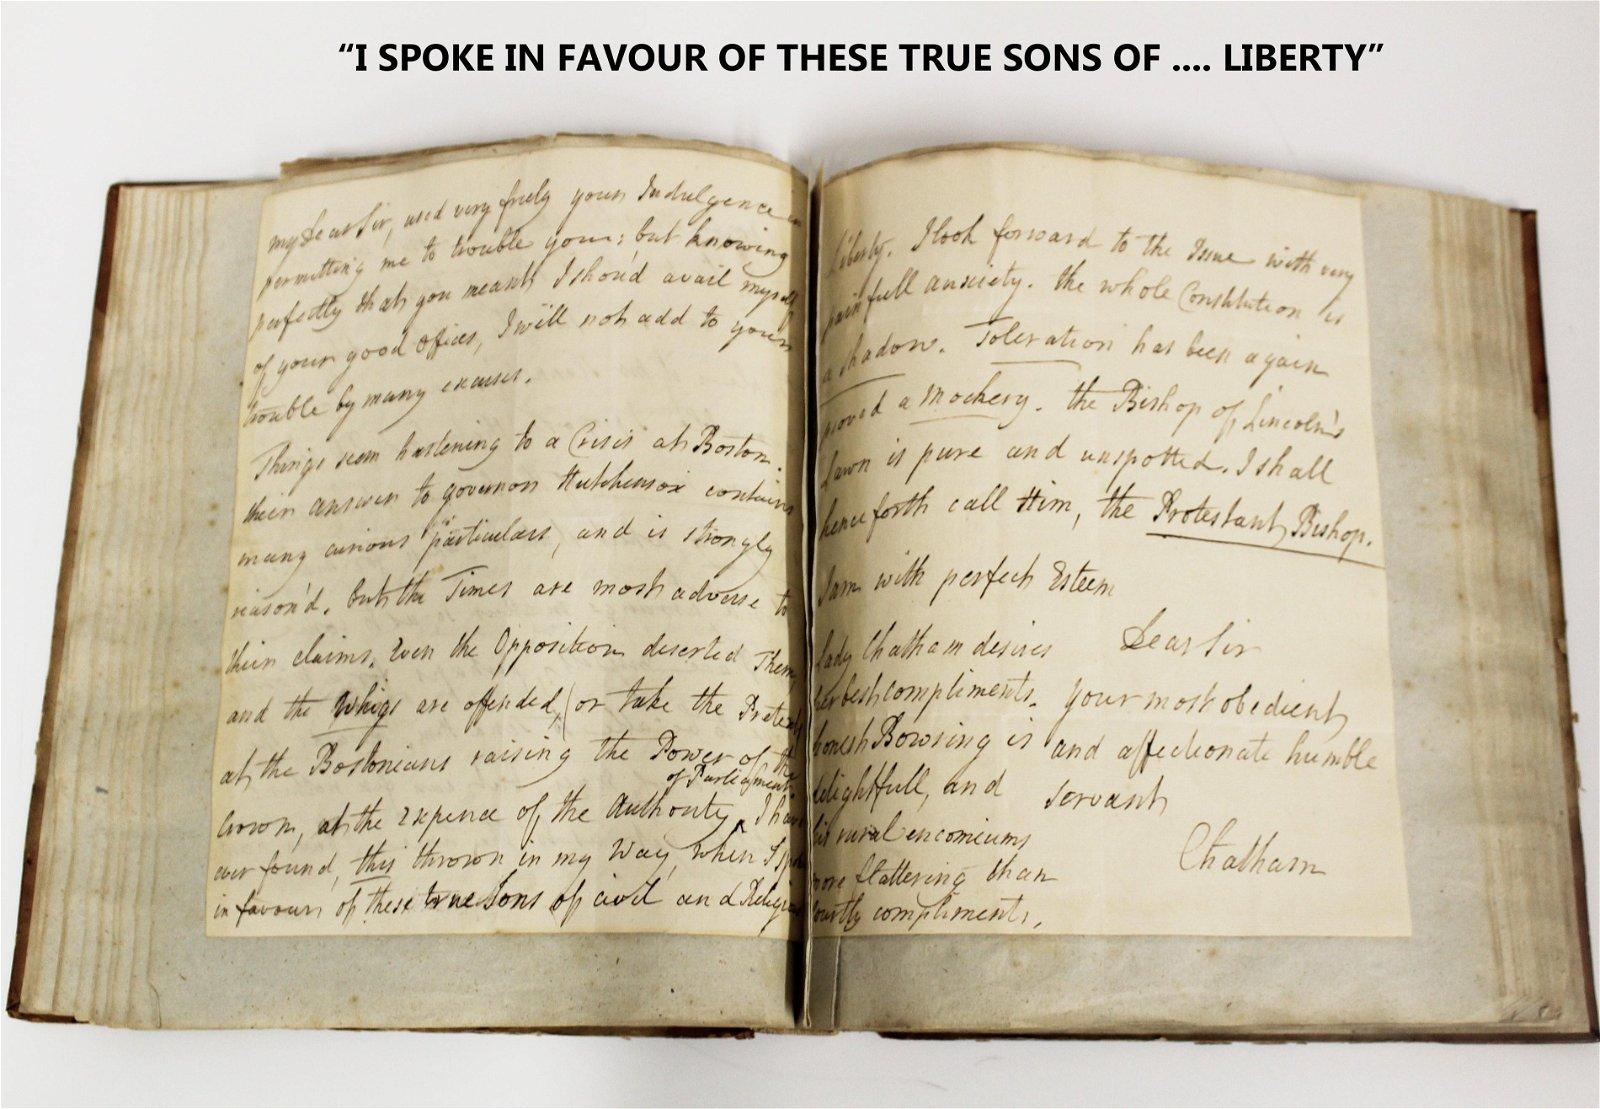 "Wm. Pitt & Seeds of Rev. War ""I spoke in favour of"